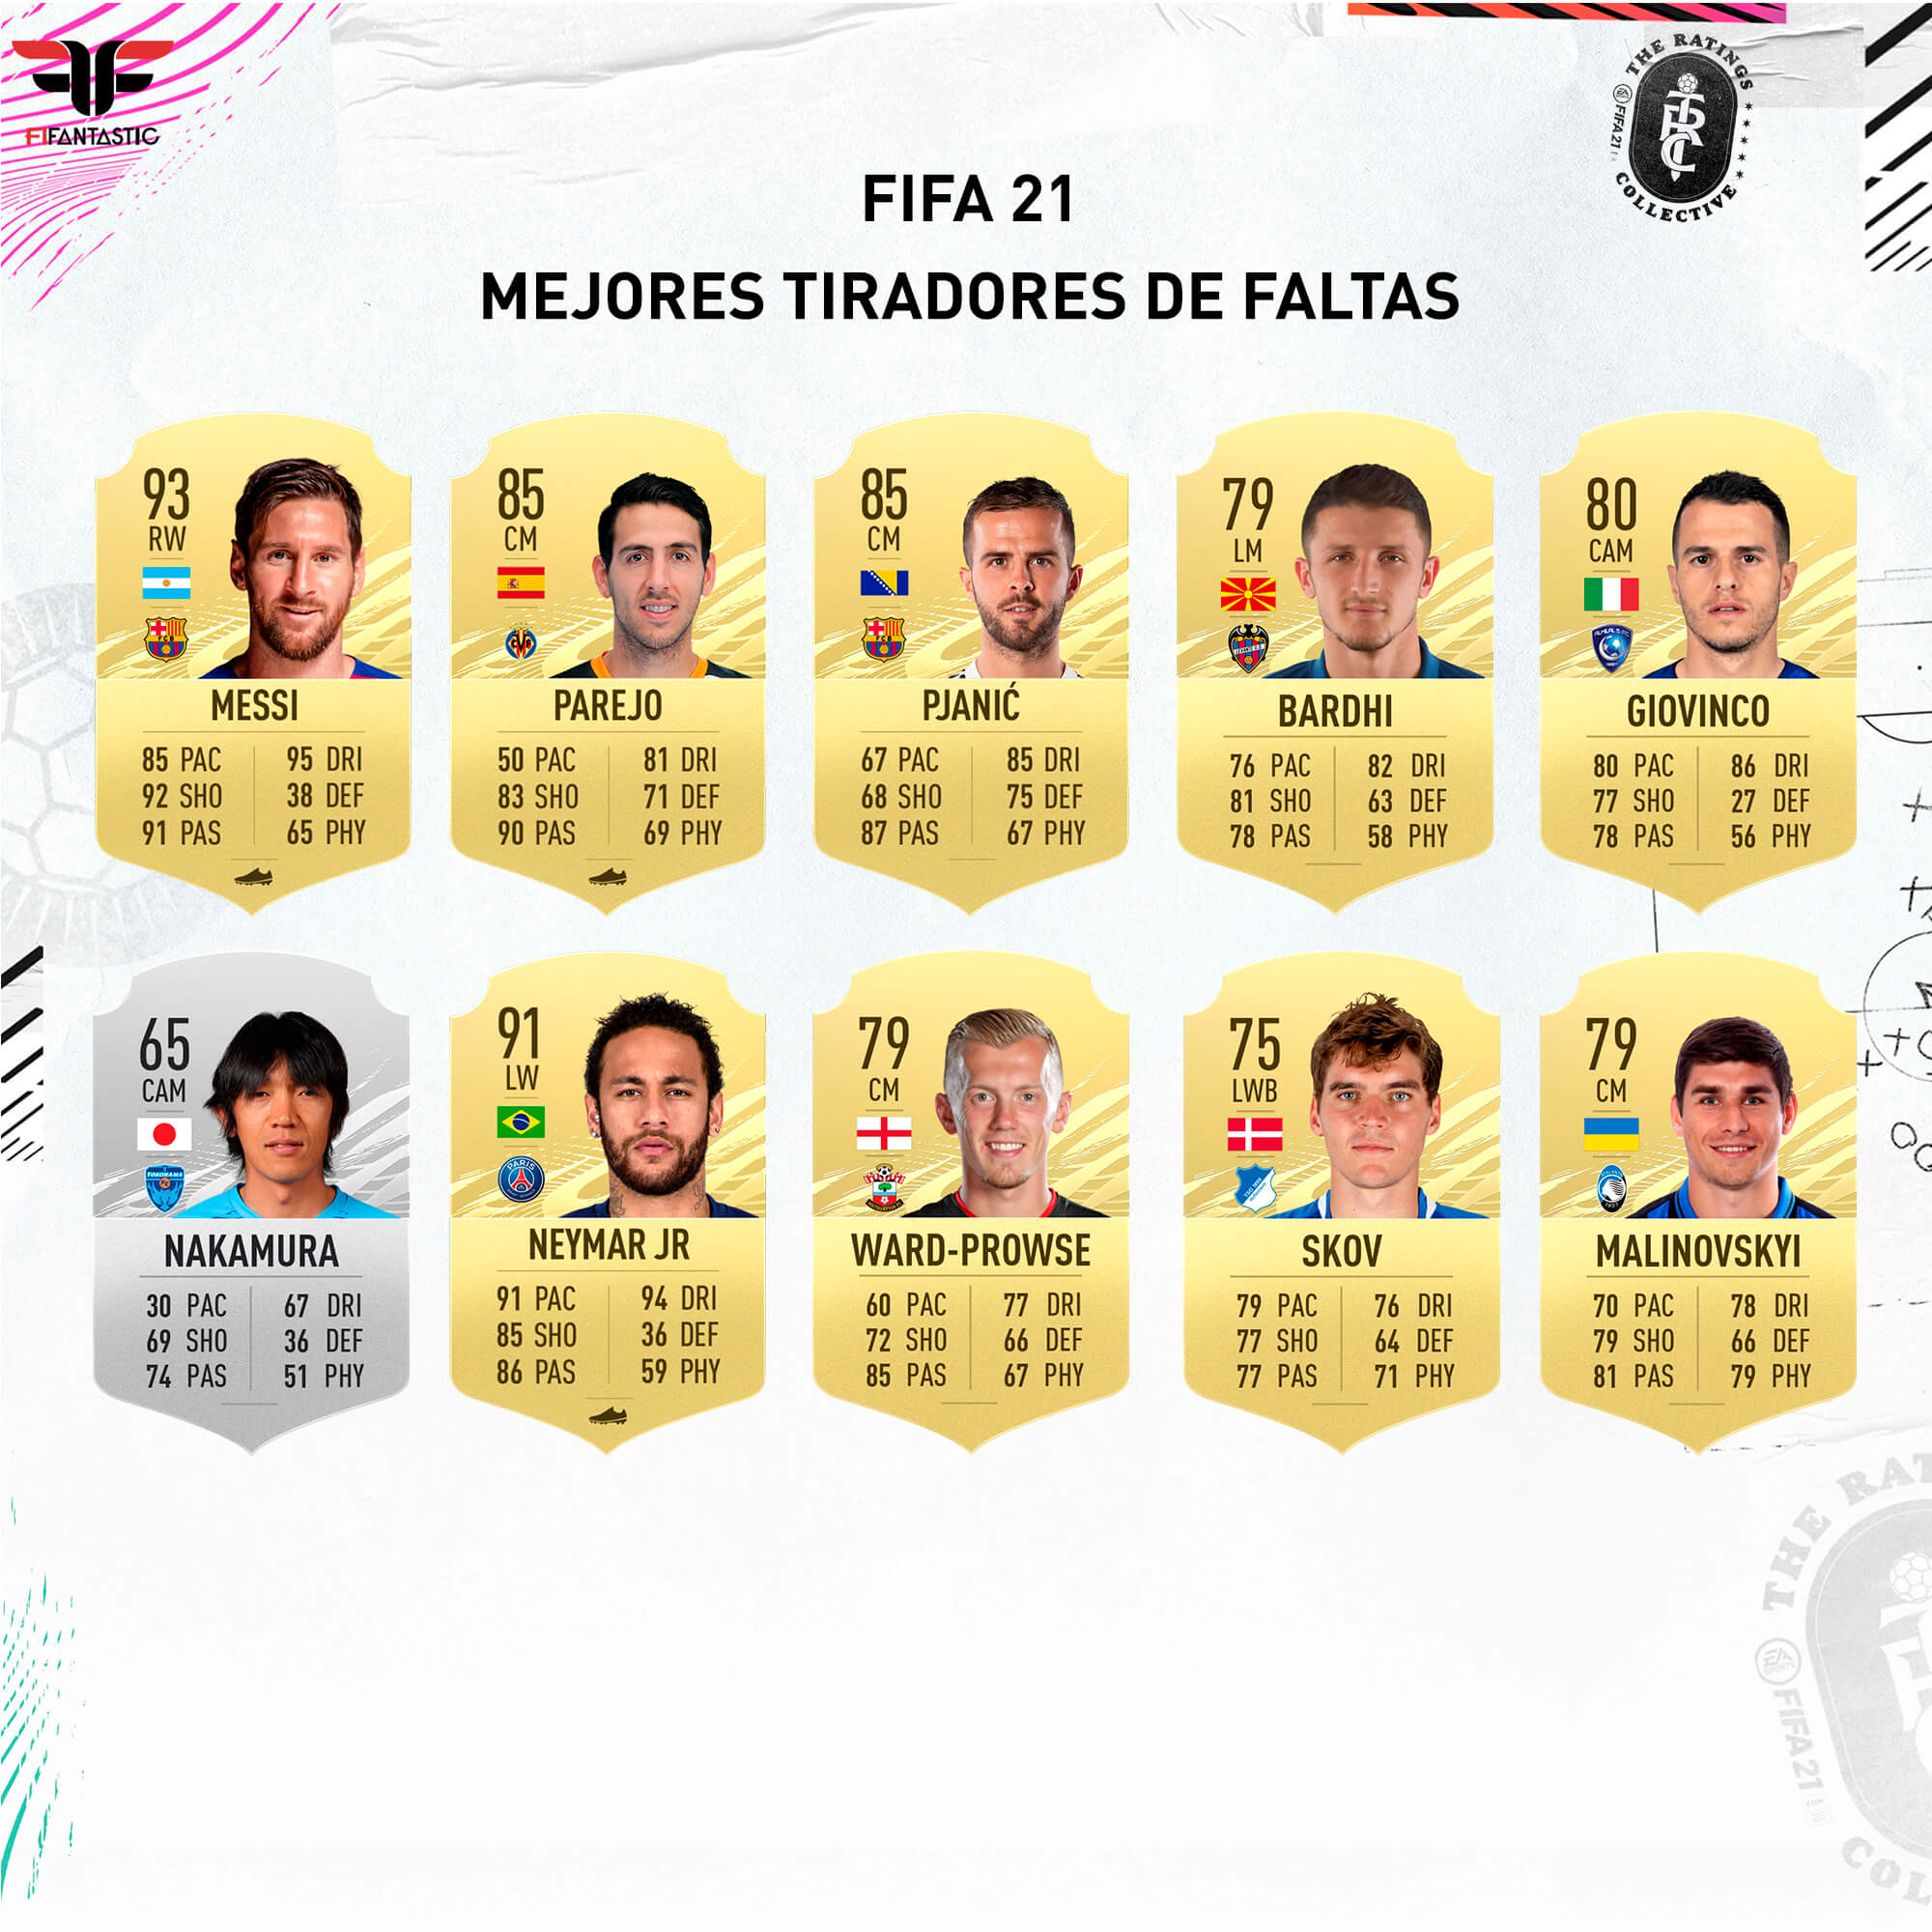 Los mejores tiradores de falta de FIFA 21